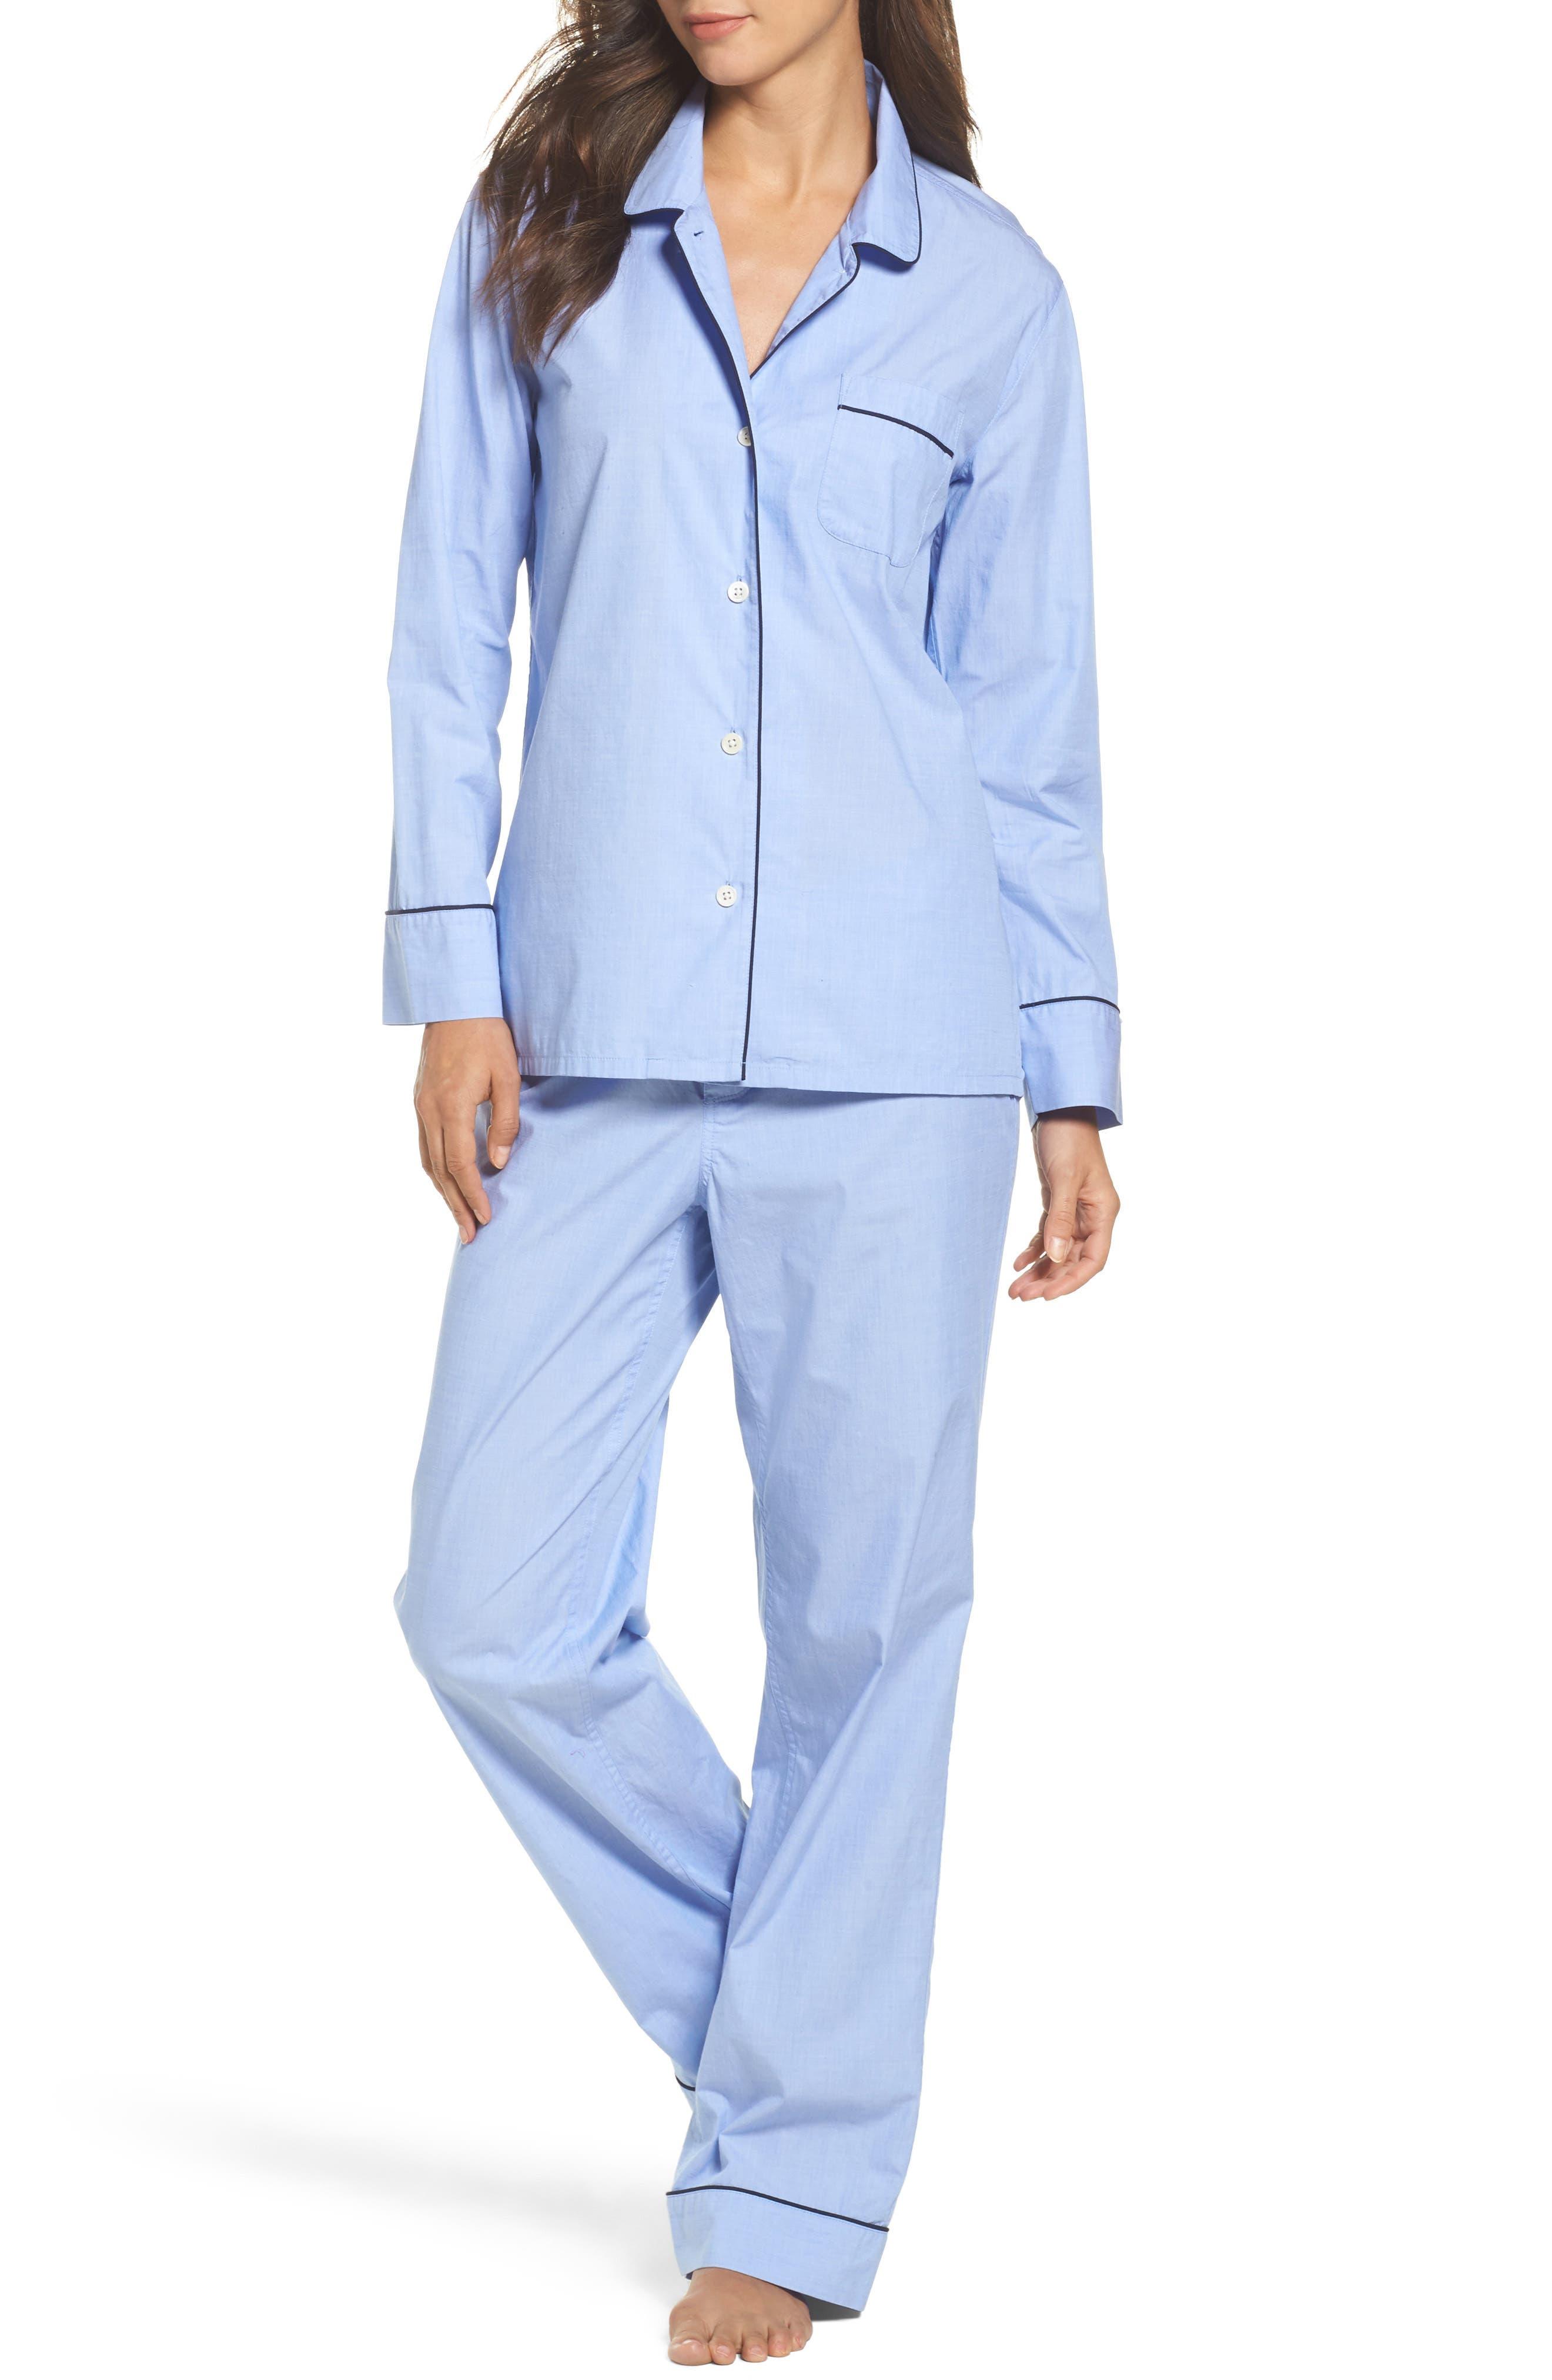 1b9ccbeea0 Women s J.Crew Pajama Sets